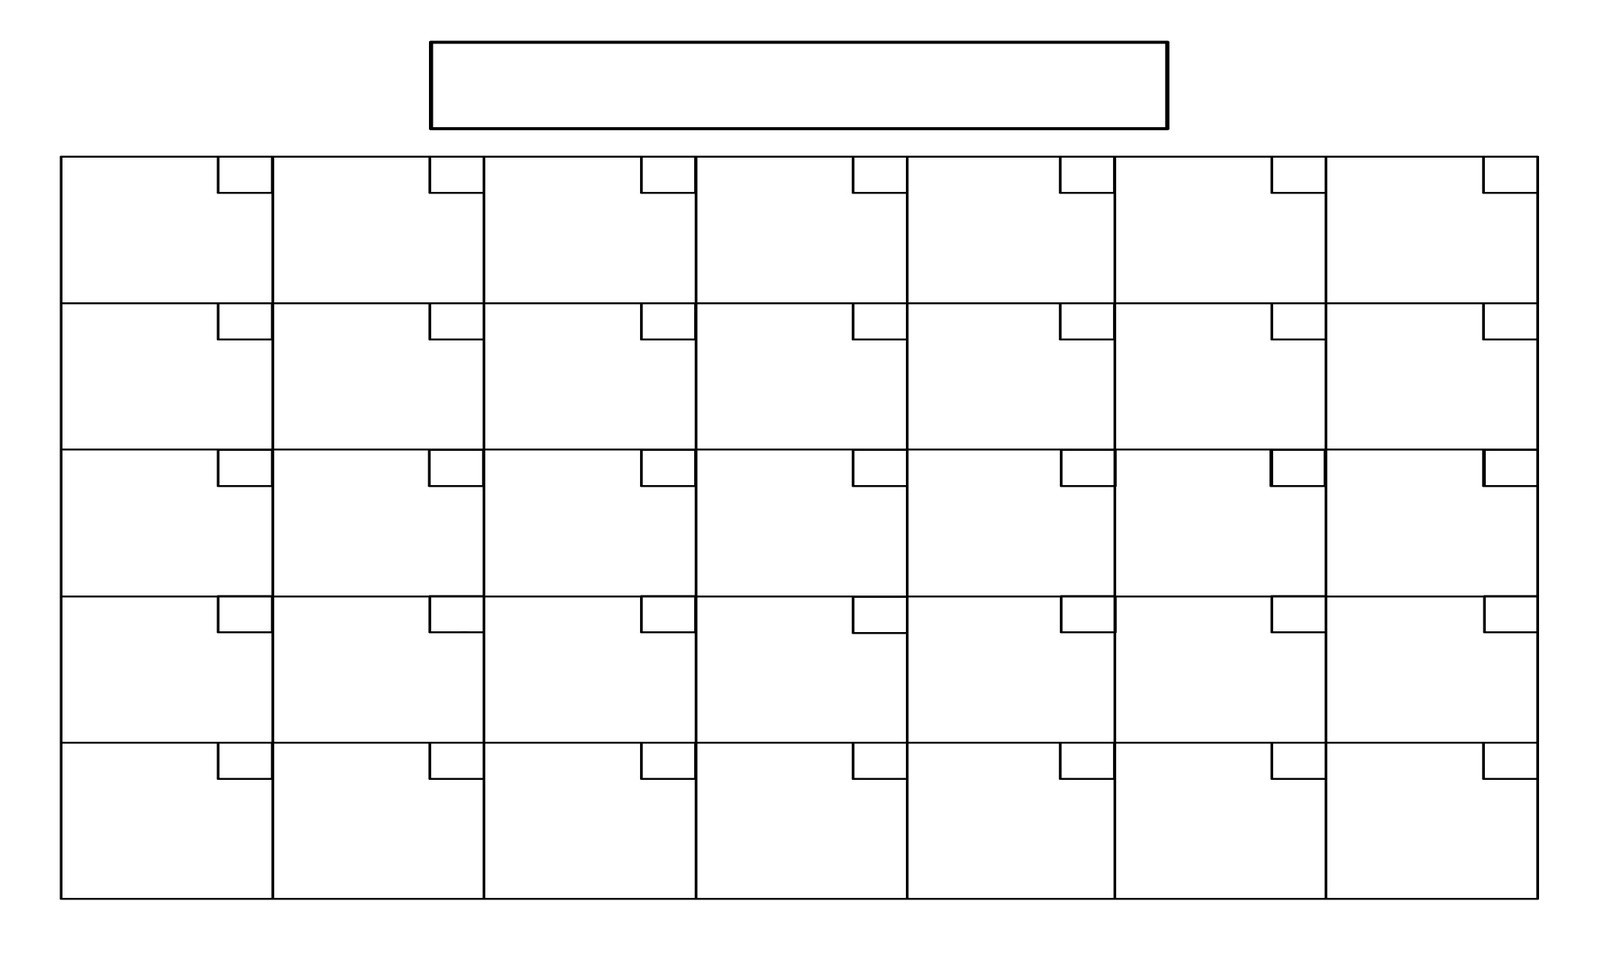 Perky Large Blank Calendar Grid • Printable Blank Calendar-Printable Blank Calendar Grid